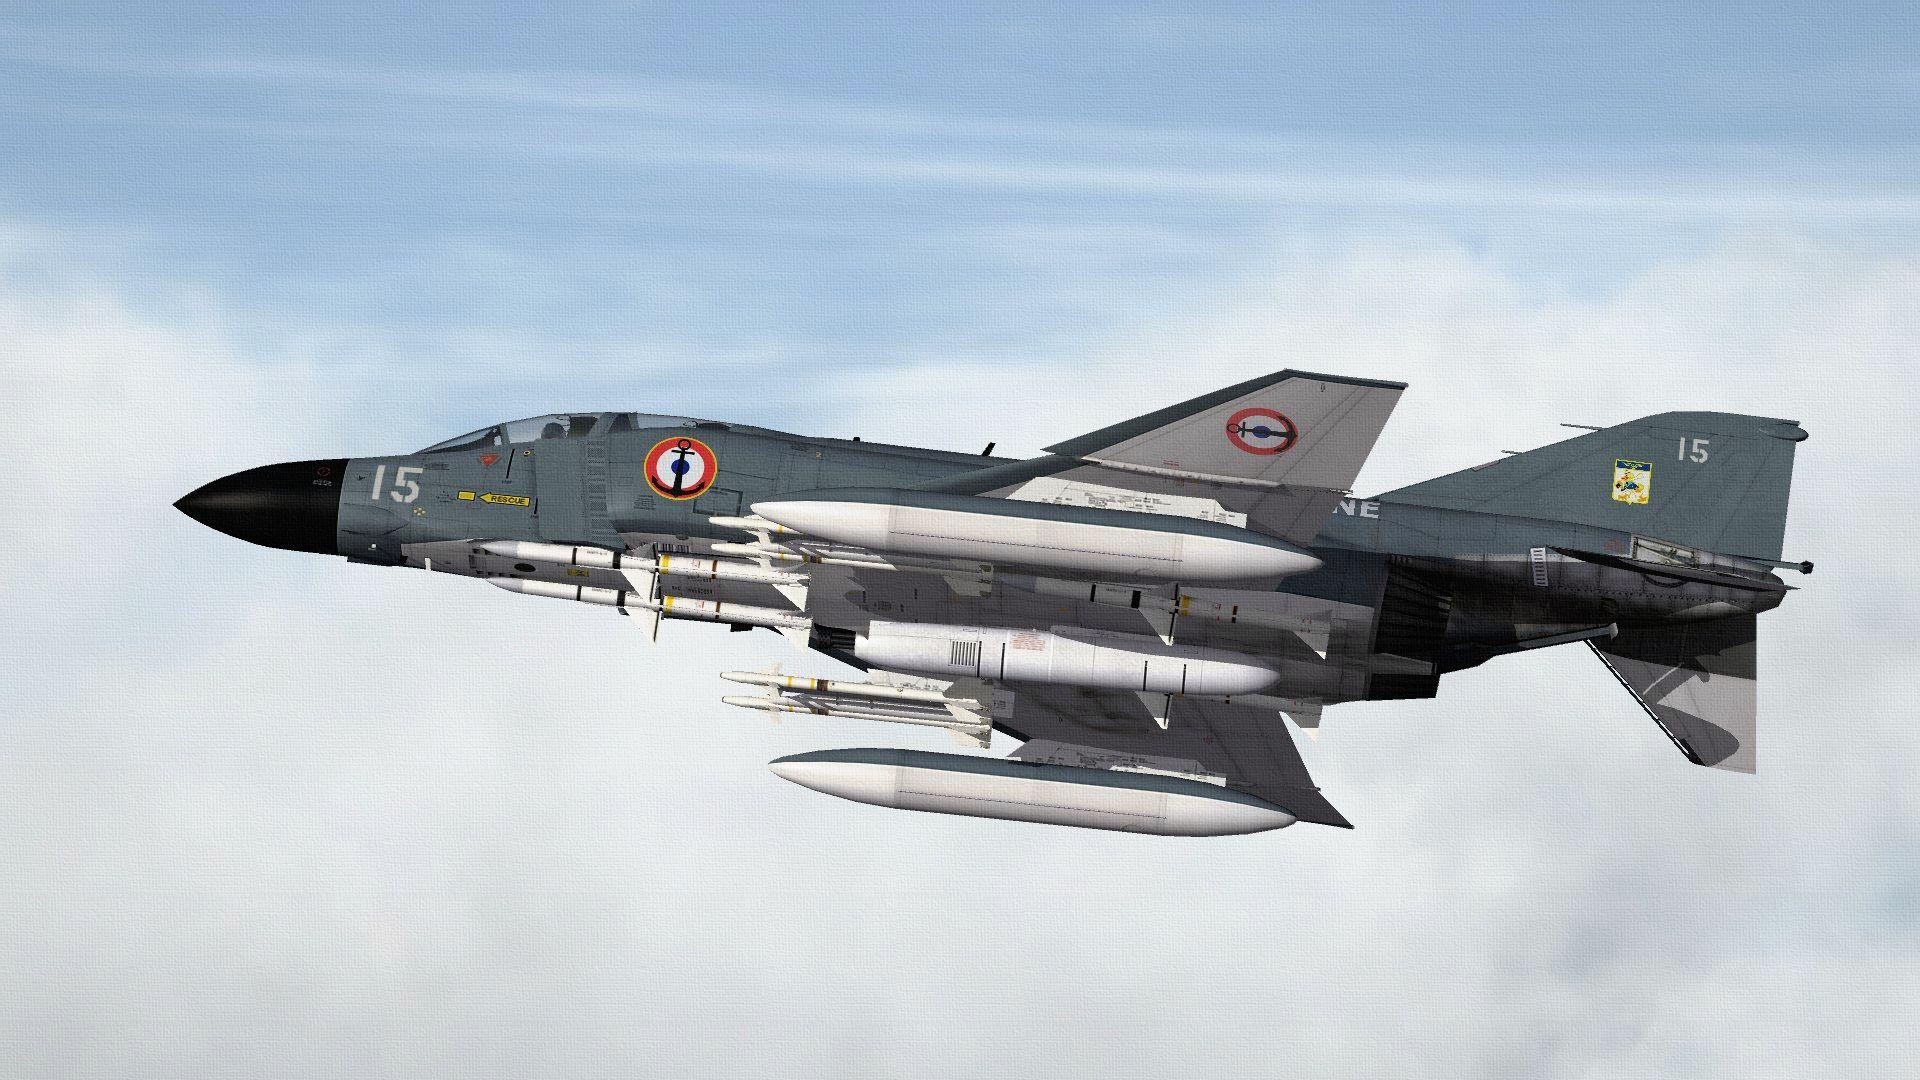 AERONAVALEF-4JPHANTOM05_zps5a8ec255.jpg